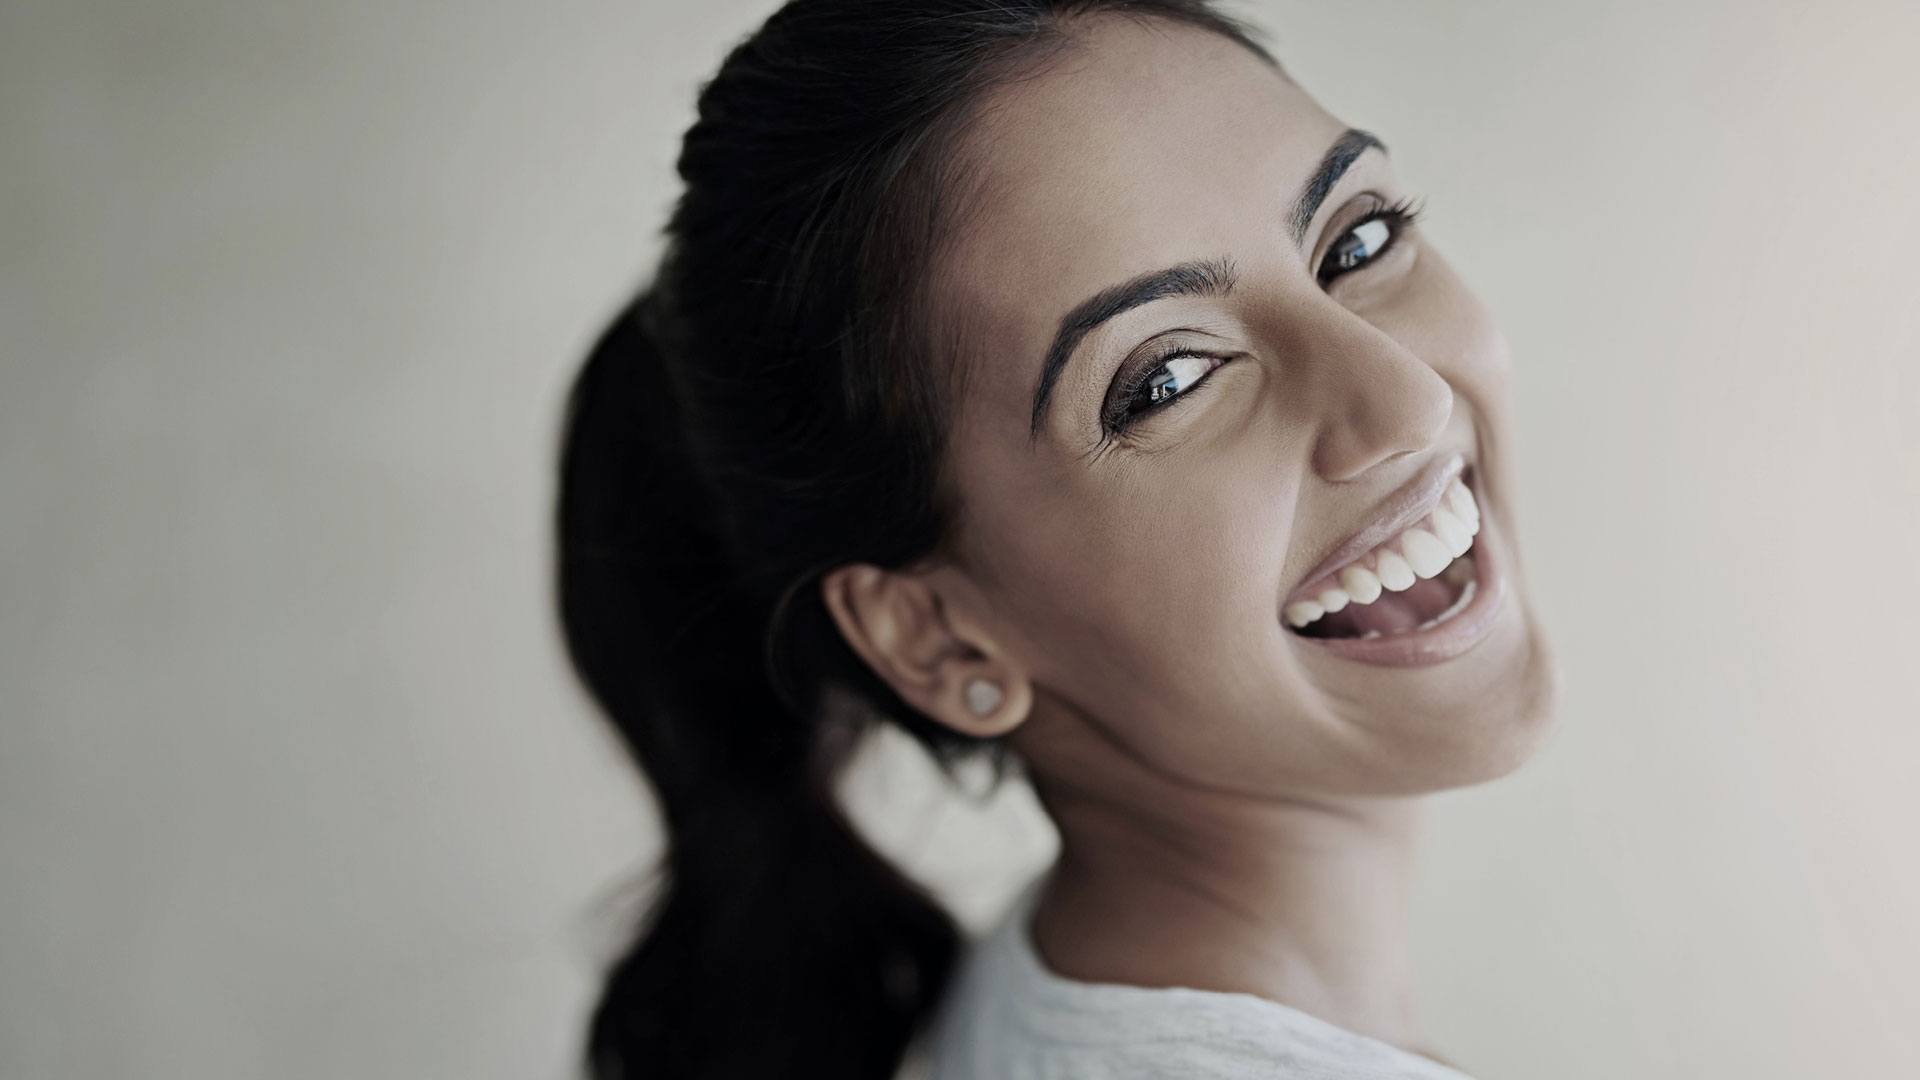 Sensational Smiles Dental Beauty